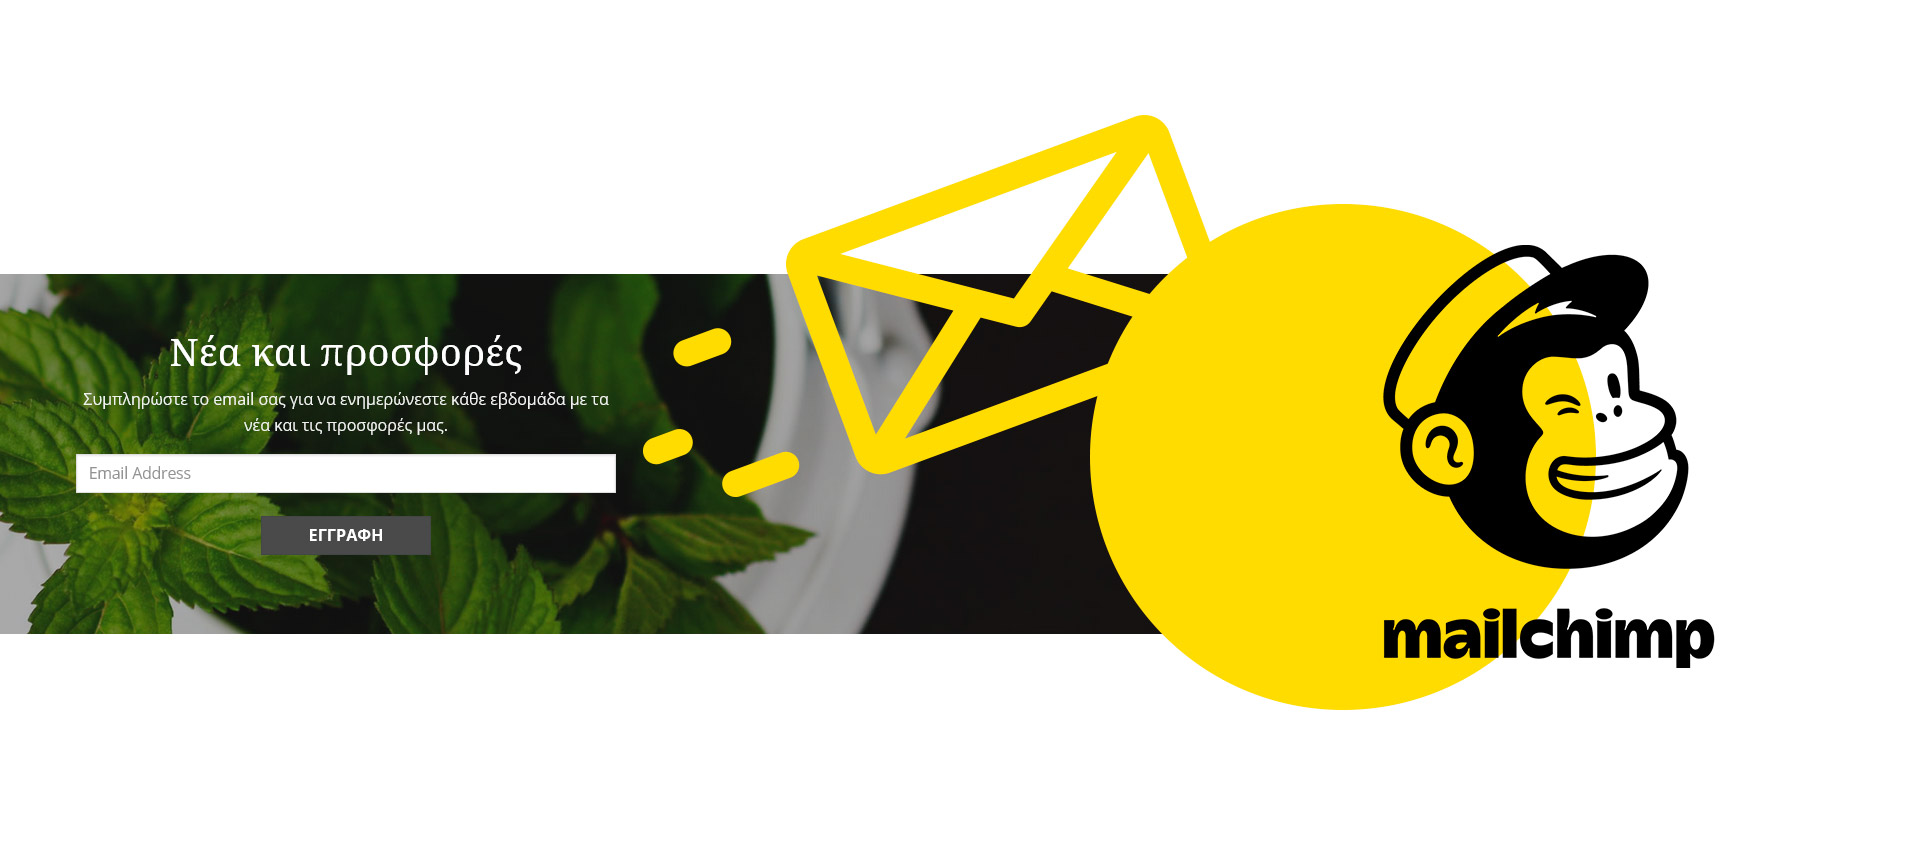 kanela-mailchimp